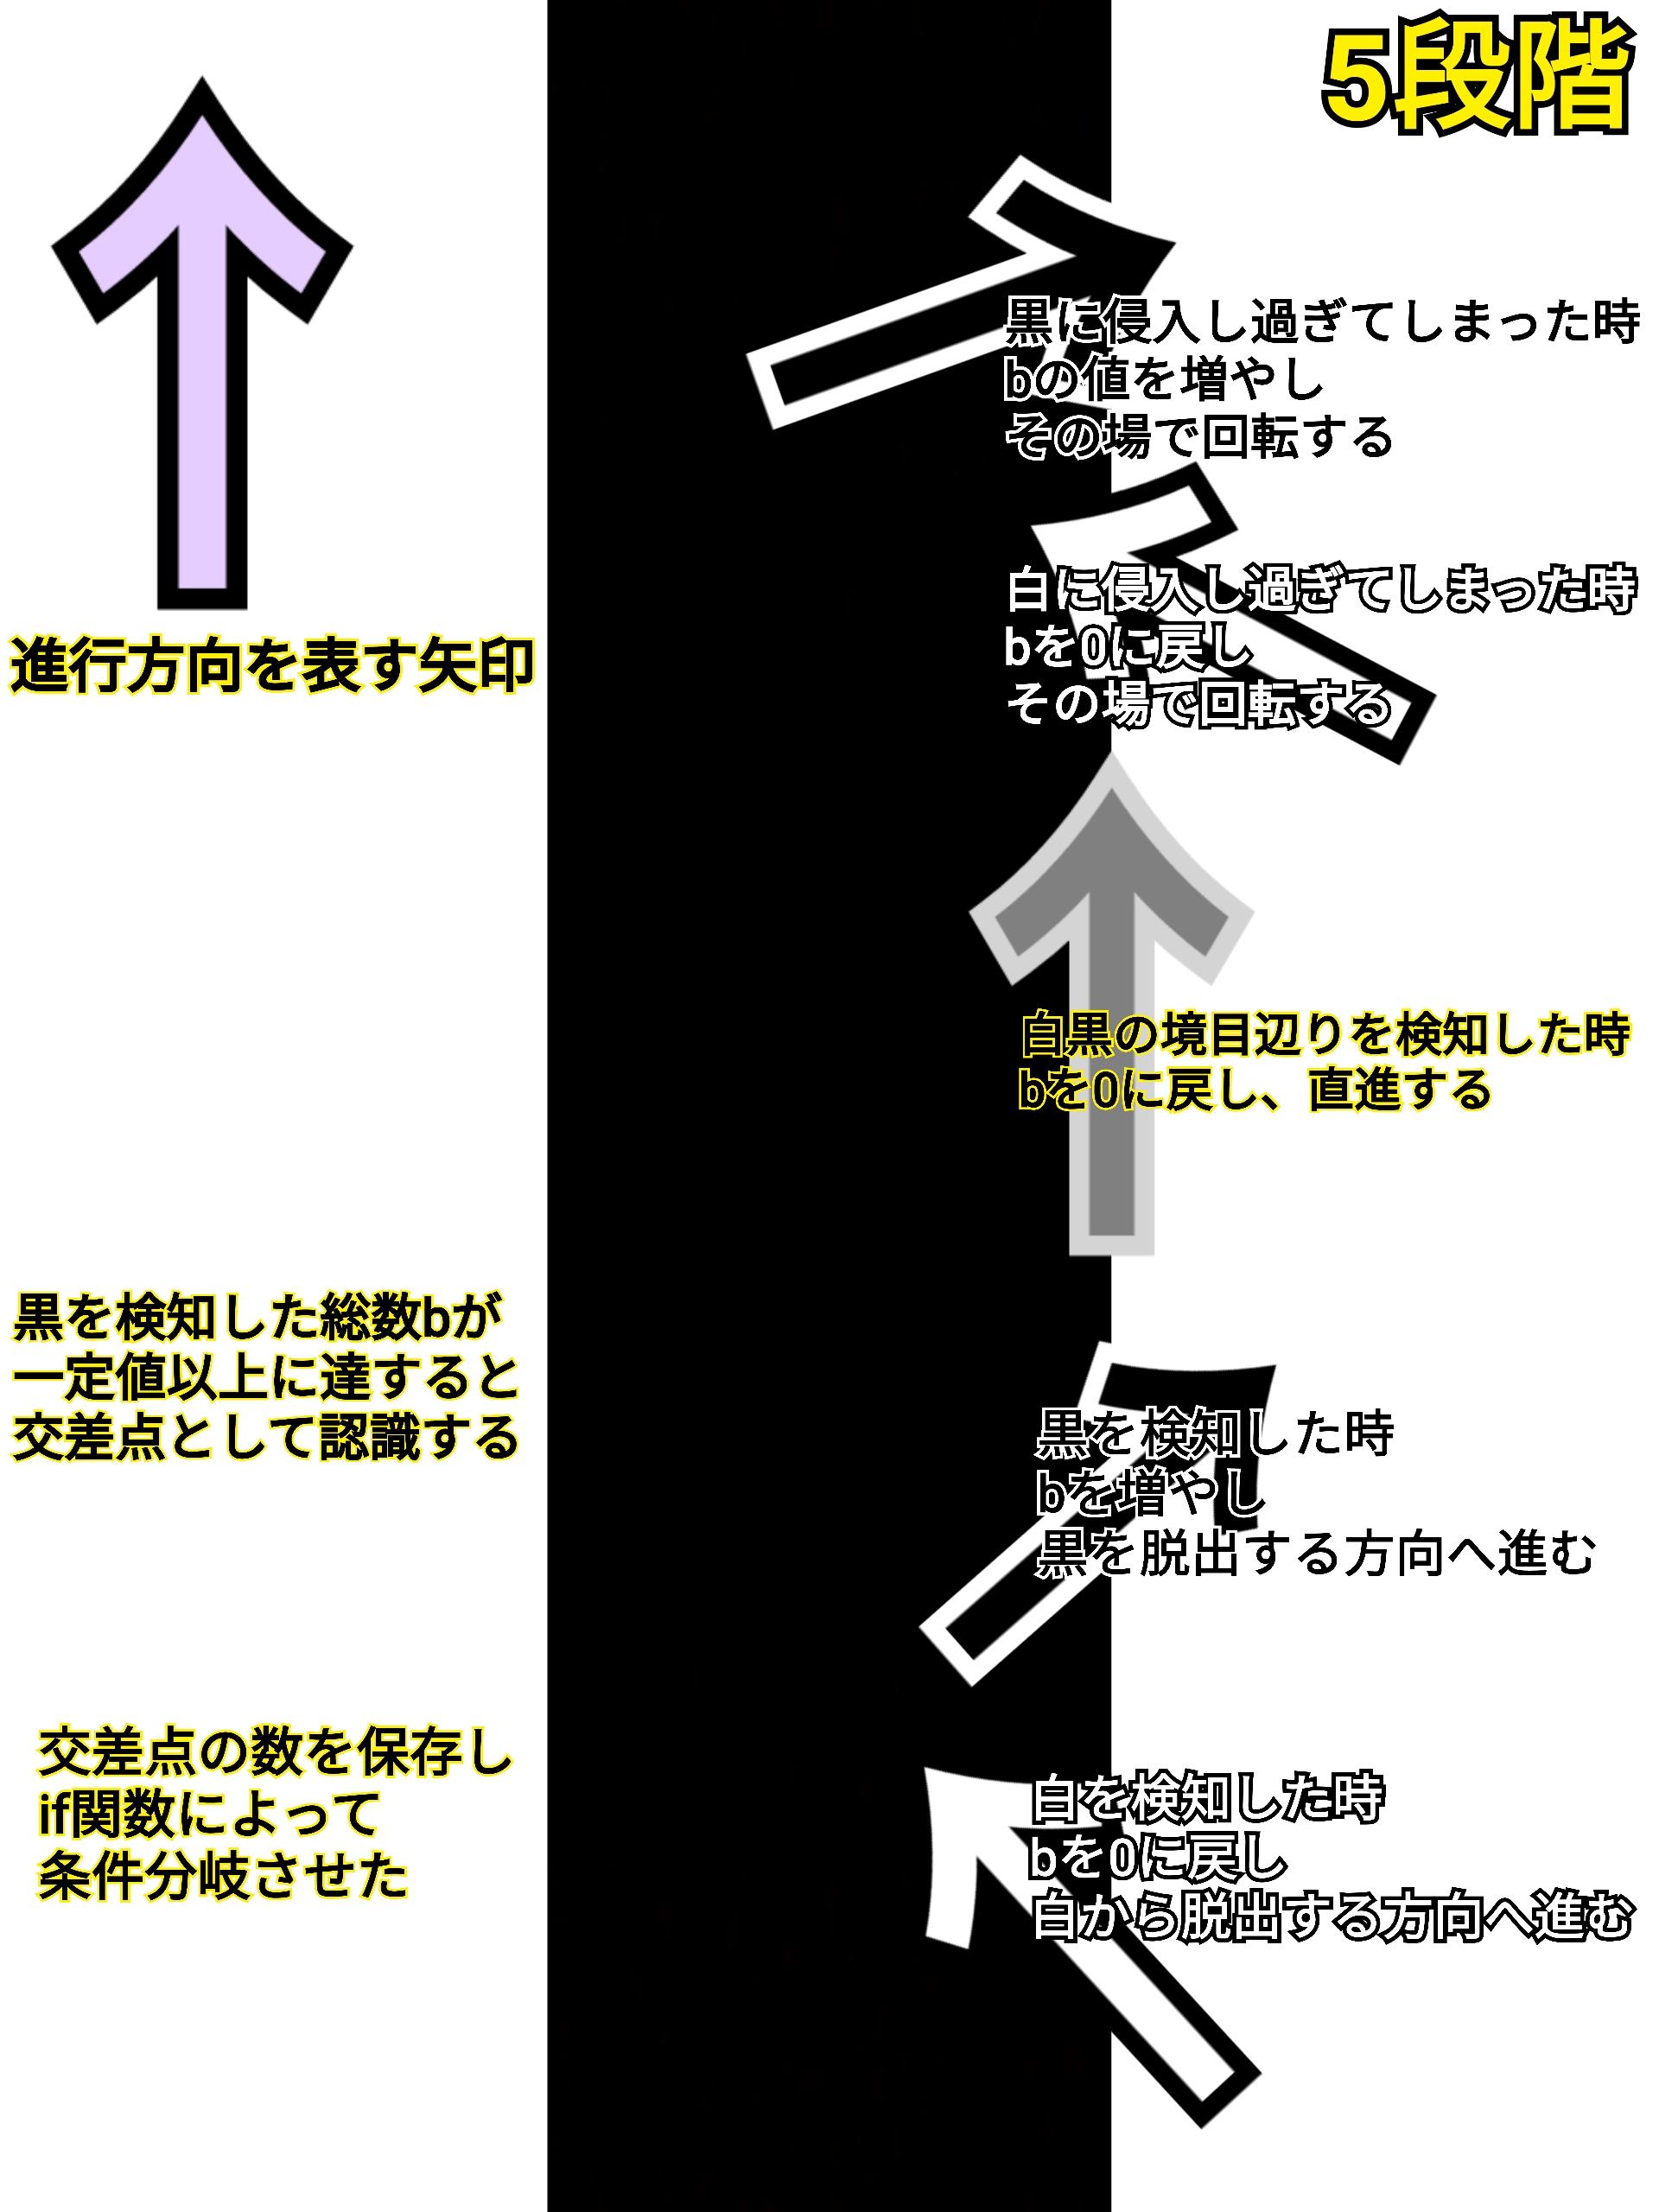 18-12-22-16-07-52-897_deco.jpg